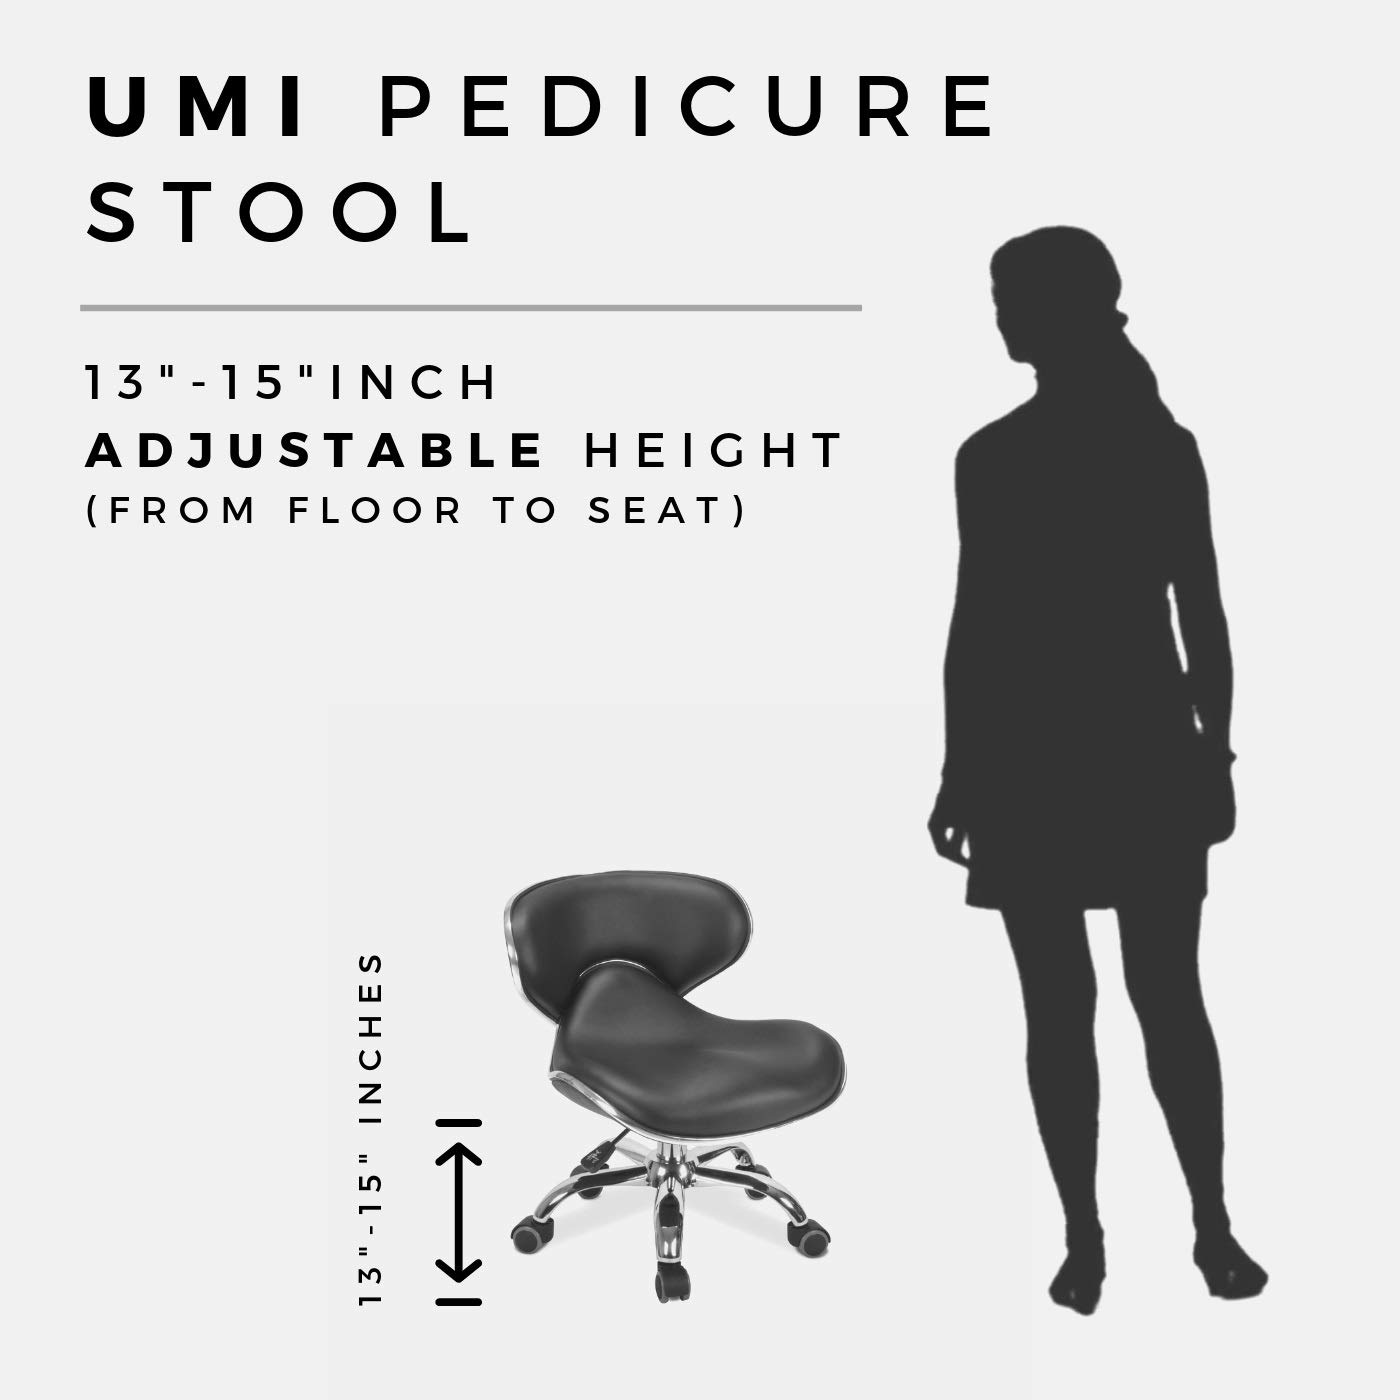 B078Z353NR MAYAKOBA SET OF 4 Nail Salon Pedicure Stool UMI BLACK Pedicure Chair Short Adjustable Comfort Pneumatic Pump Salon Furniture & Equipment 41-T0XJmvkL